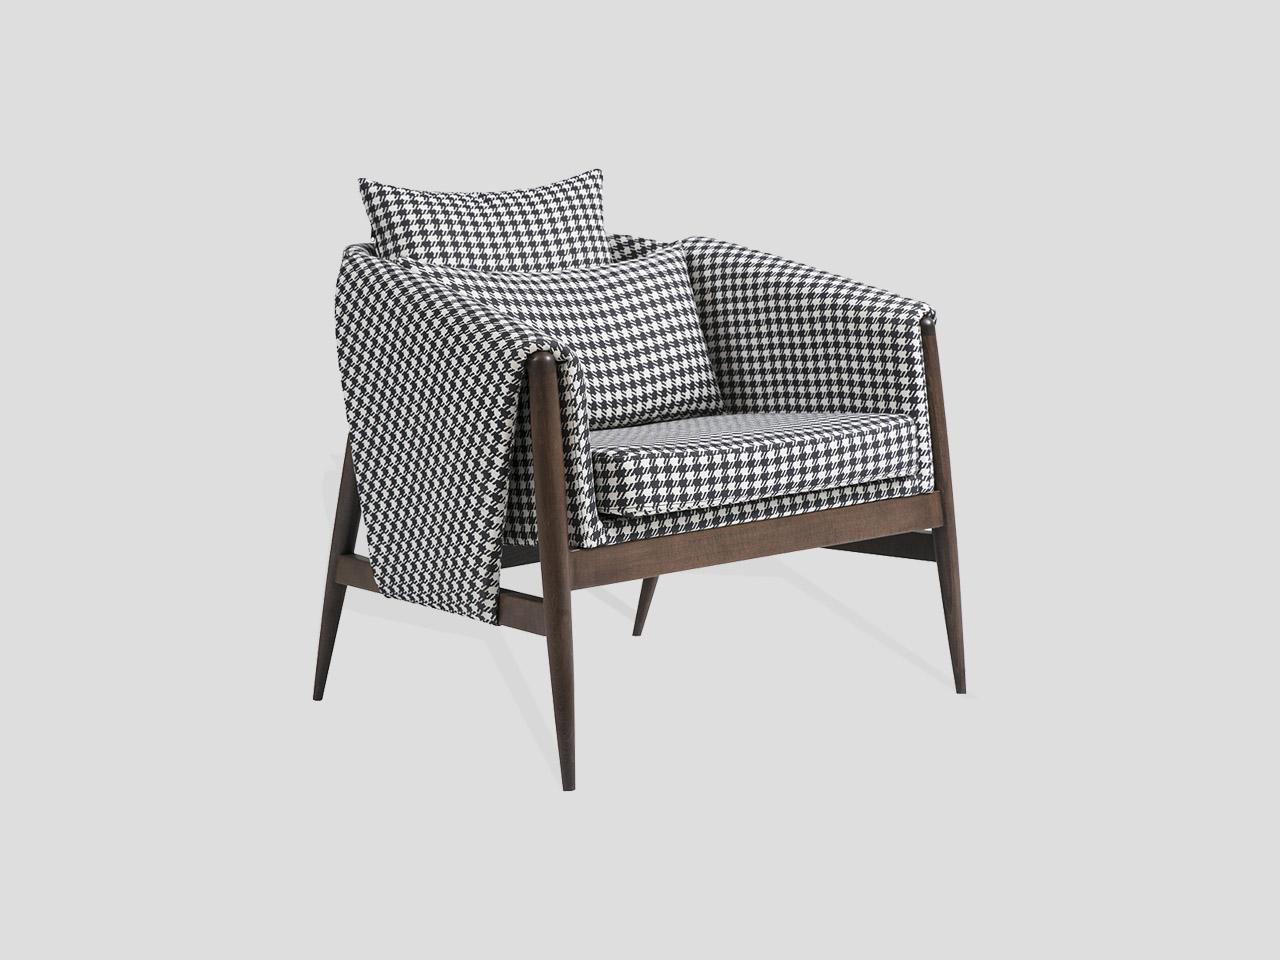 gizele moderna retro fotelja